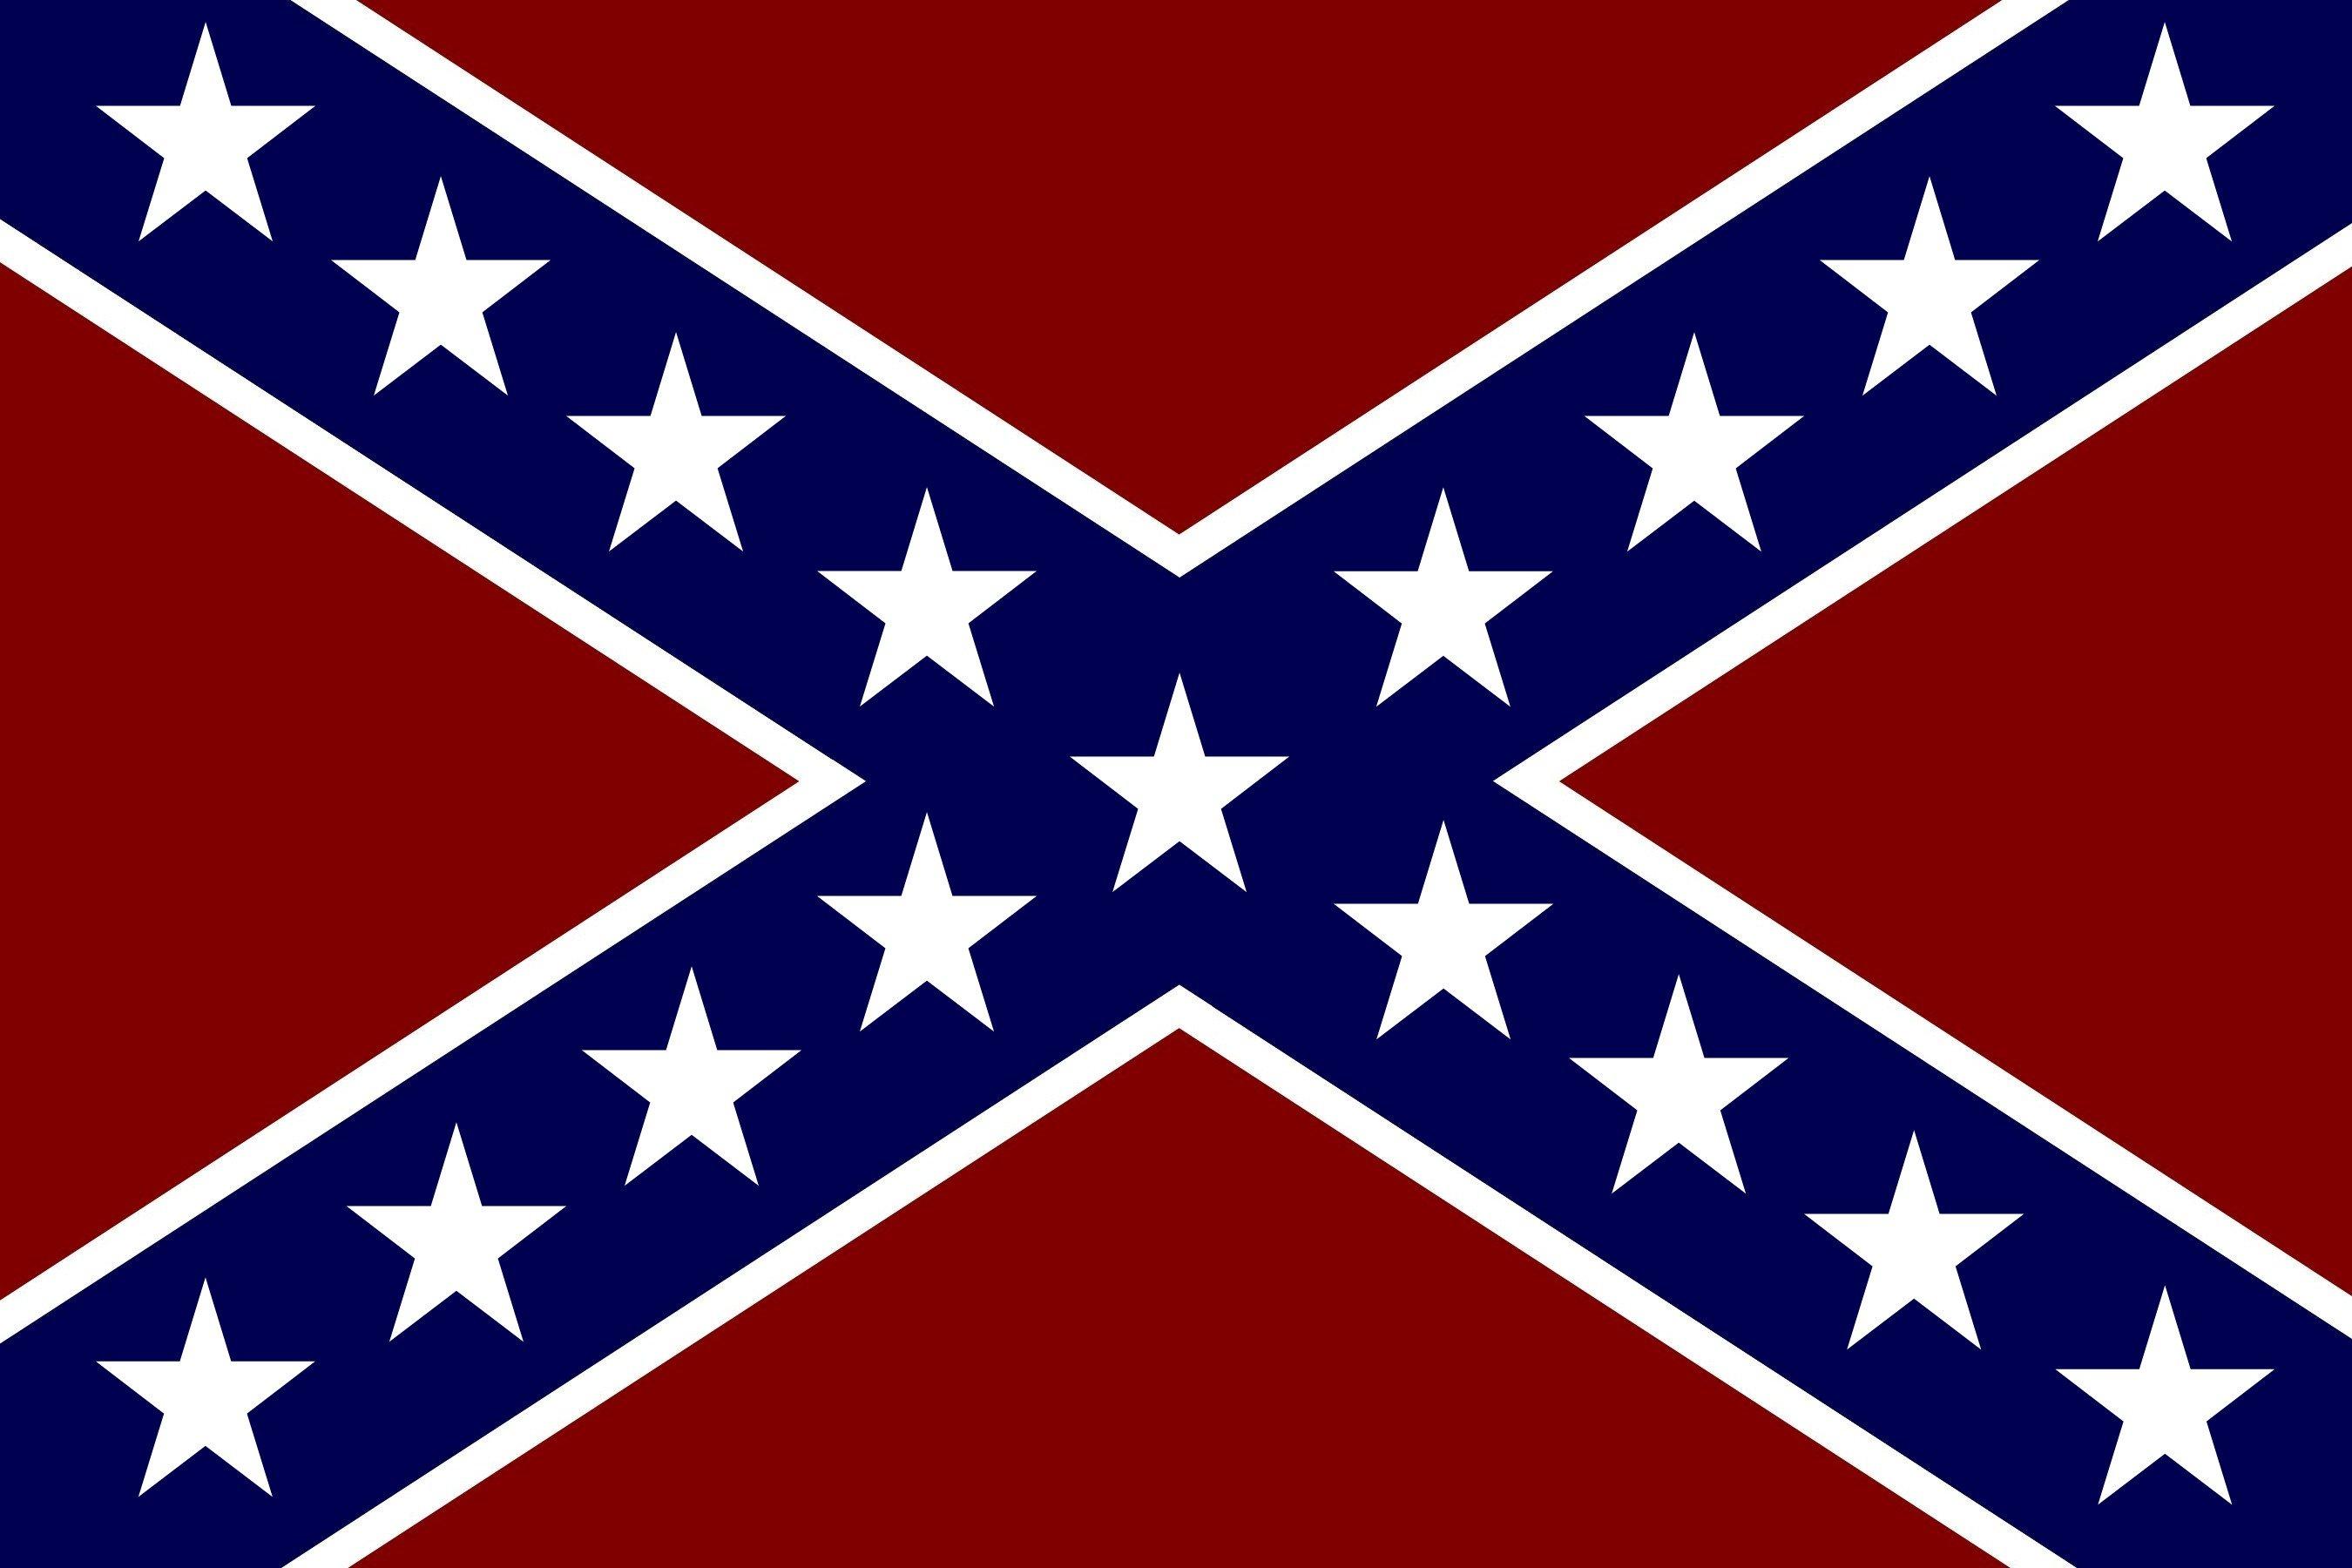 states csa civil war rebel dixie military poster wallpaper background 2700x1800